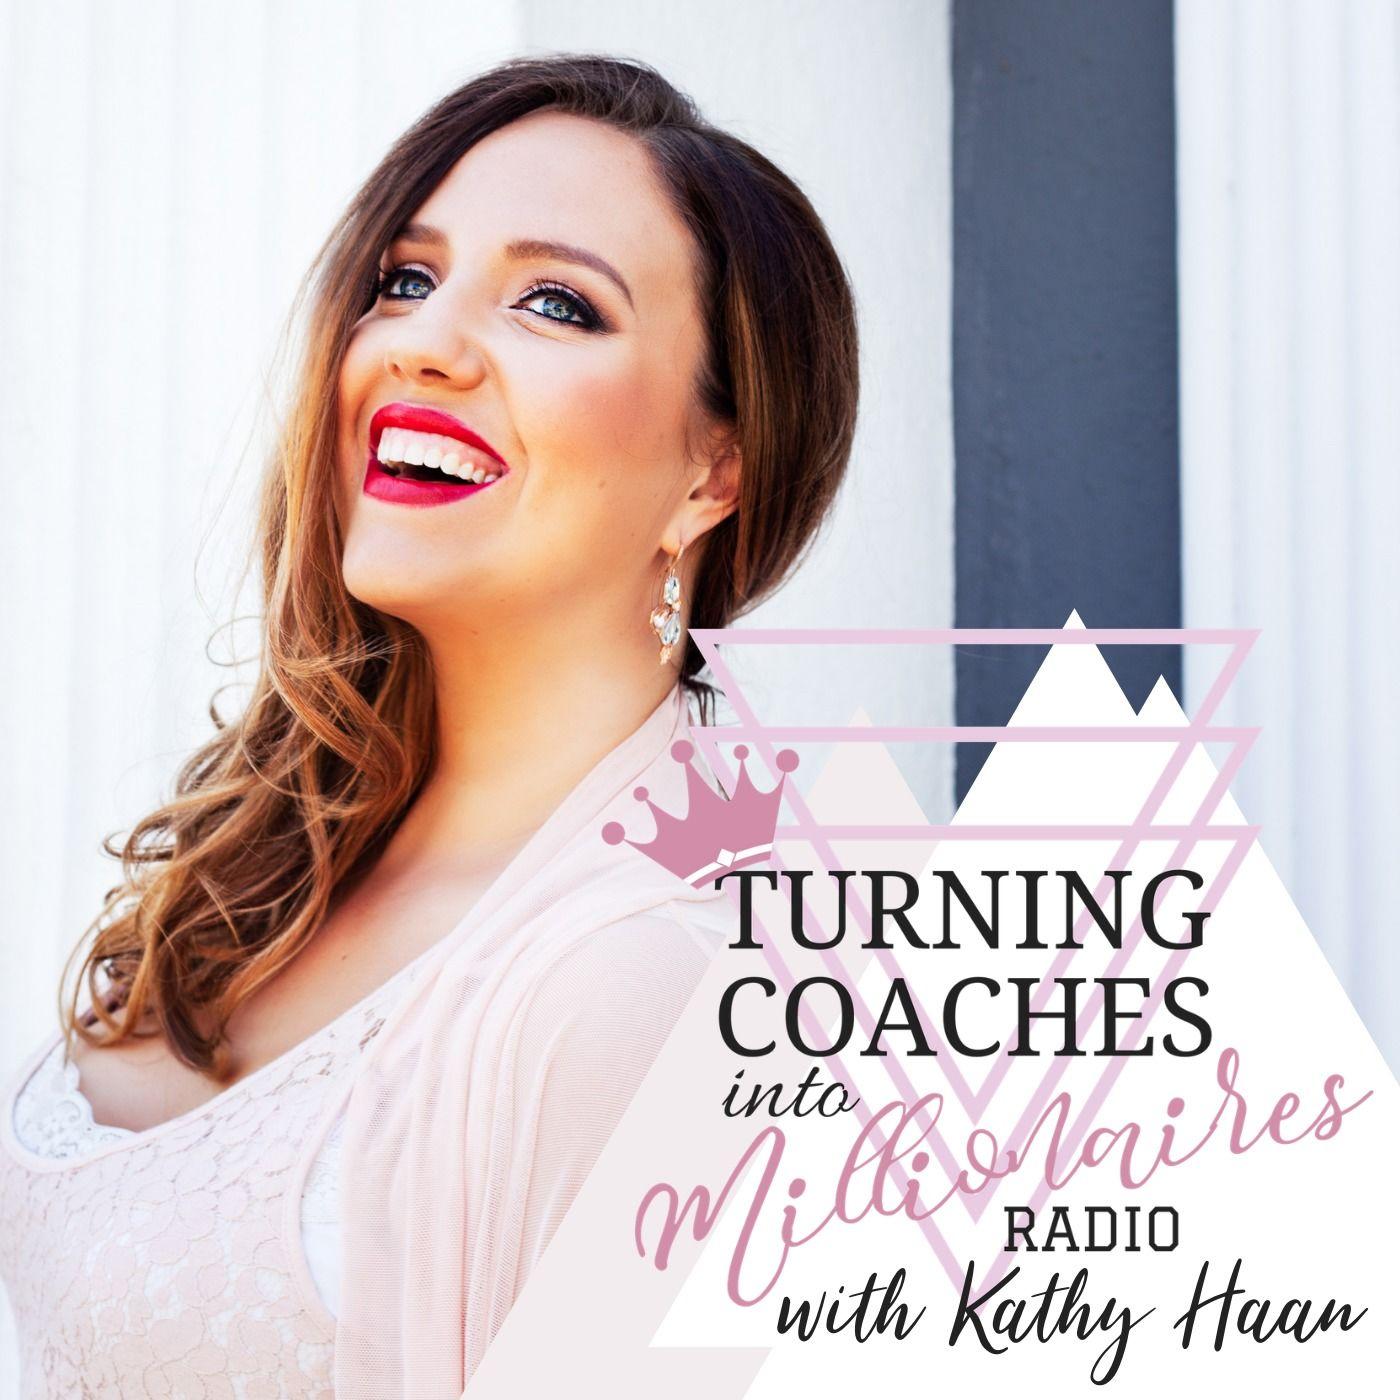 Turning Coaches into Millionaires Radio